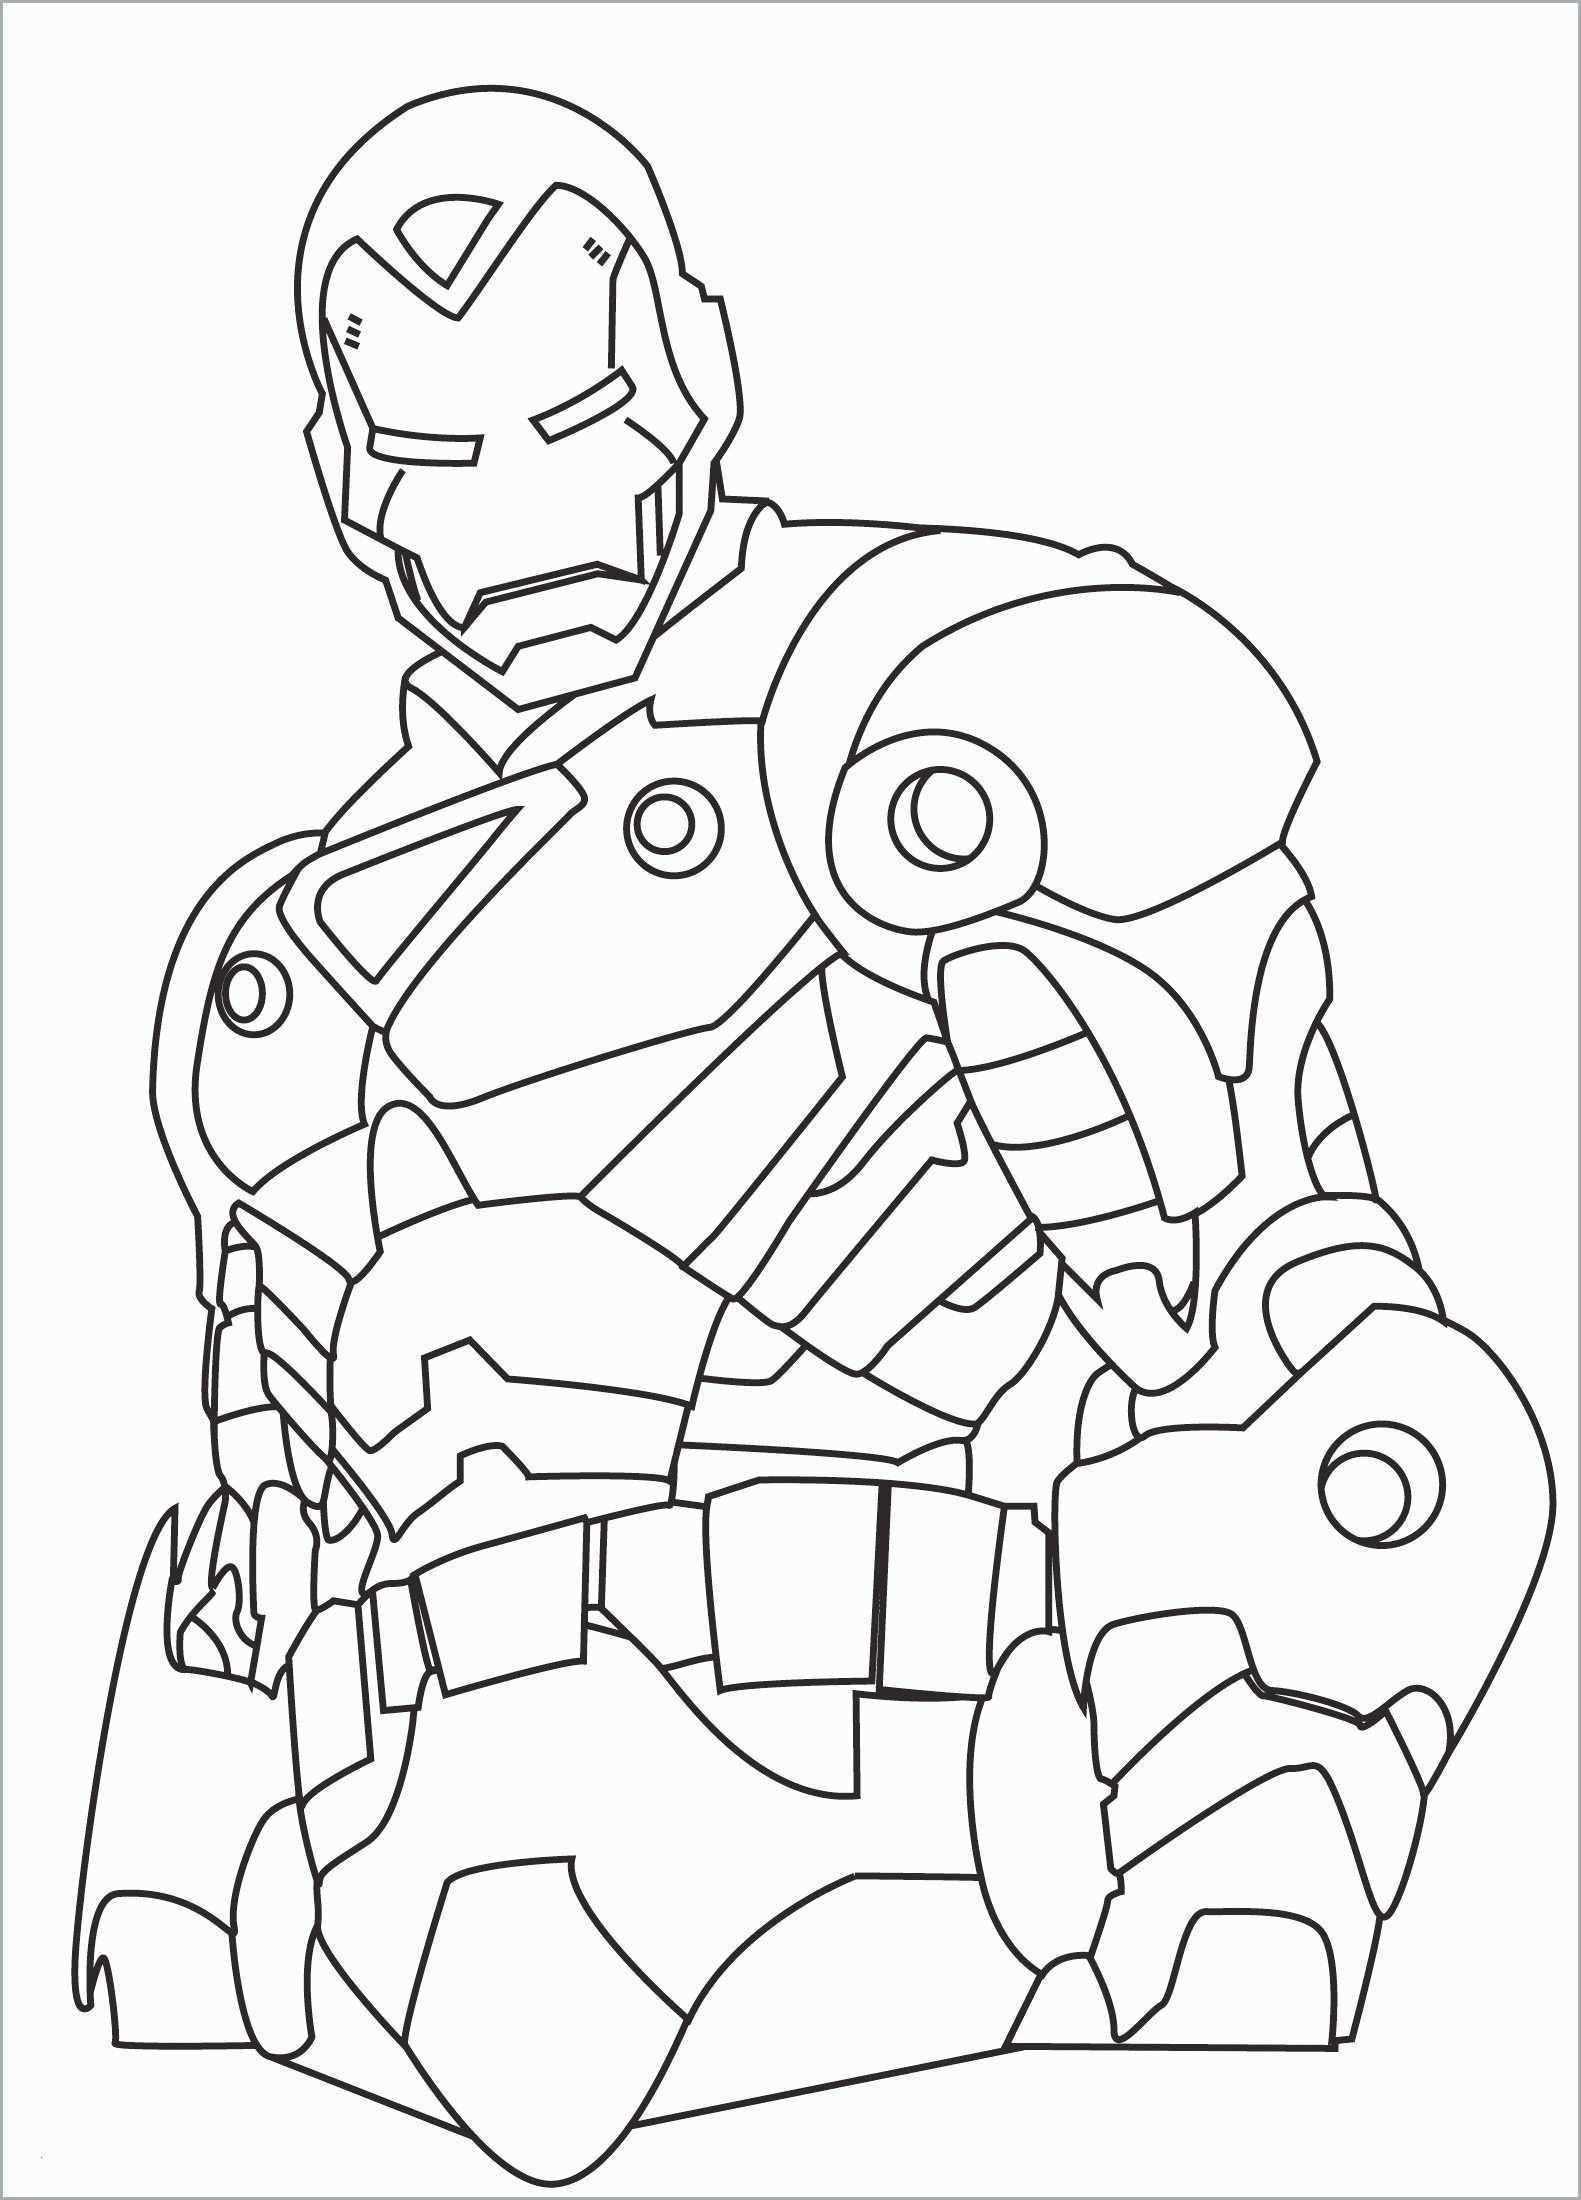 Ausmalbilder Captain America Das Beste Von New Minion Avengers Coloring Pages – Nocn Galerie